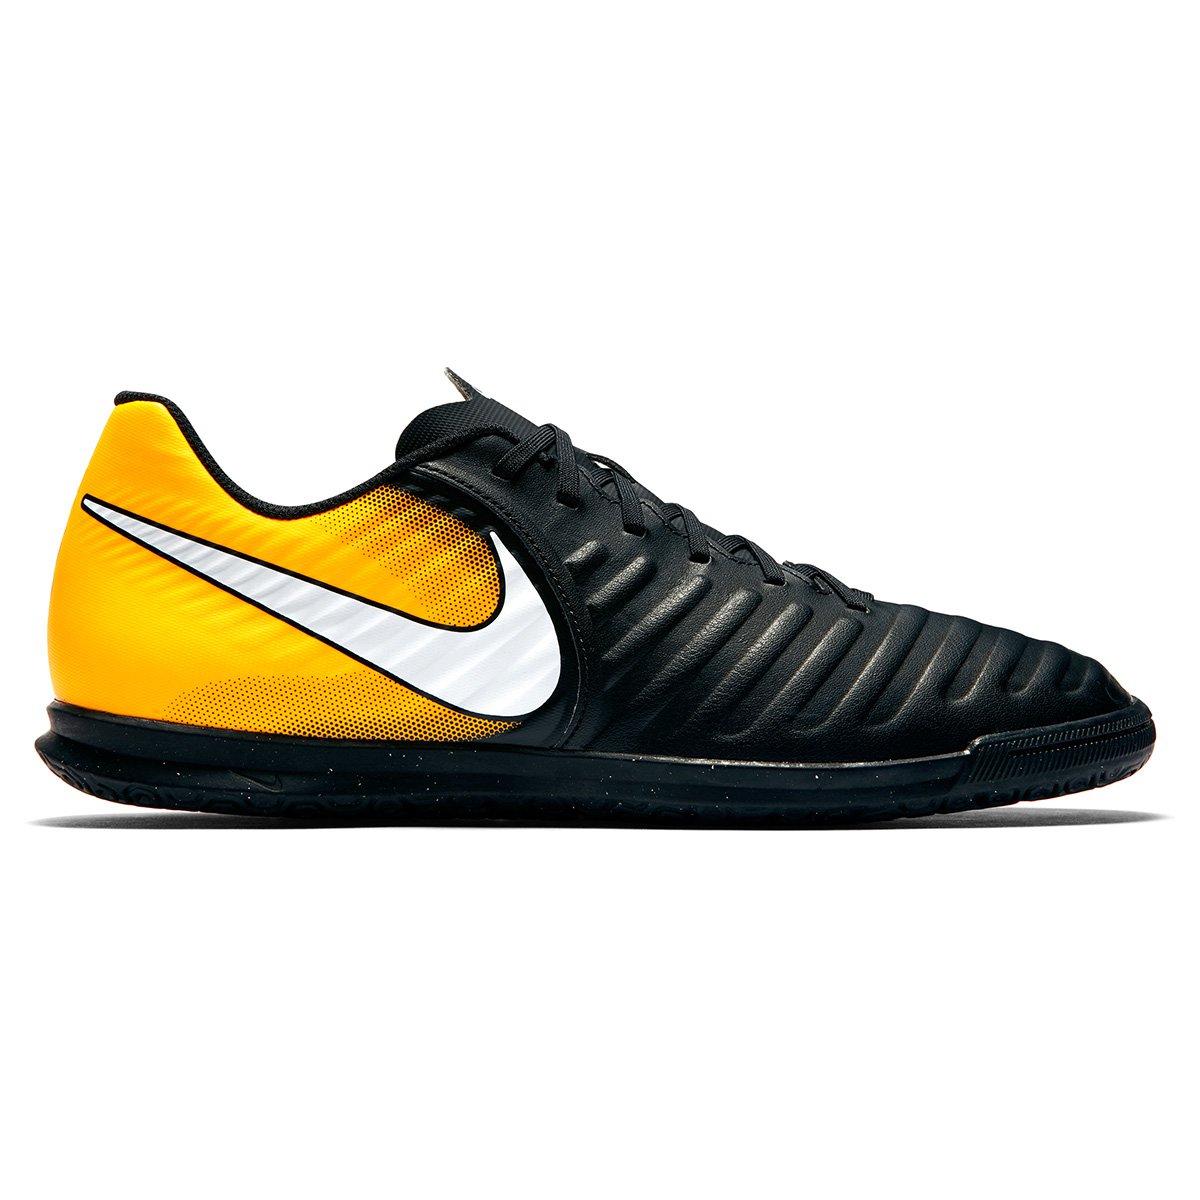 99c23b9f2e Chuteira Futsal Nike Tiempo Rio 4 IC - Preto e Laranja - Compre ...